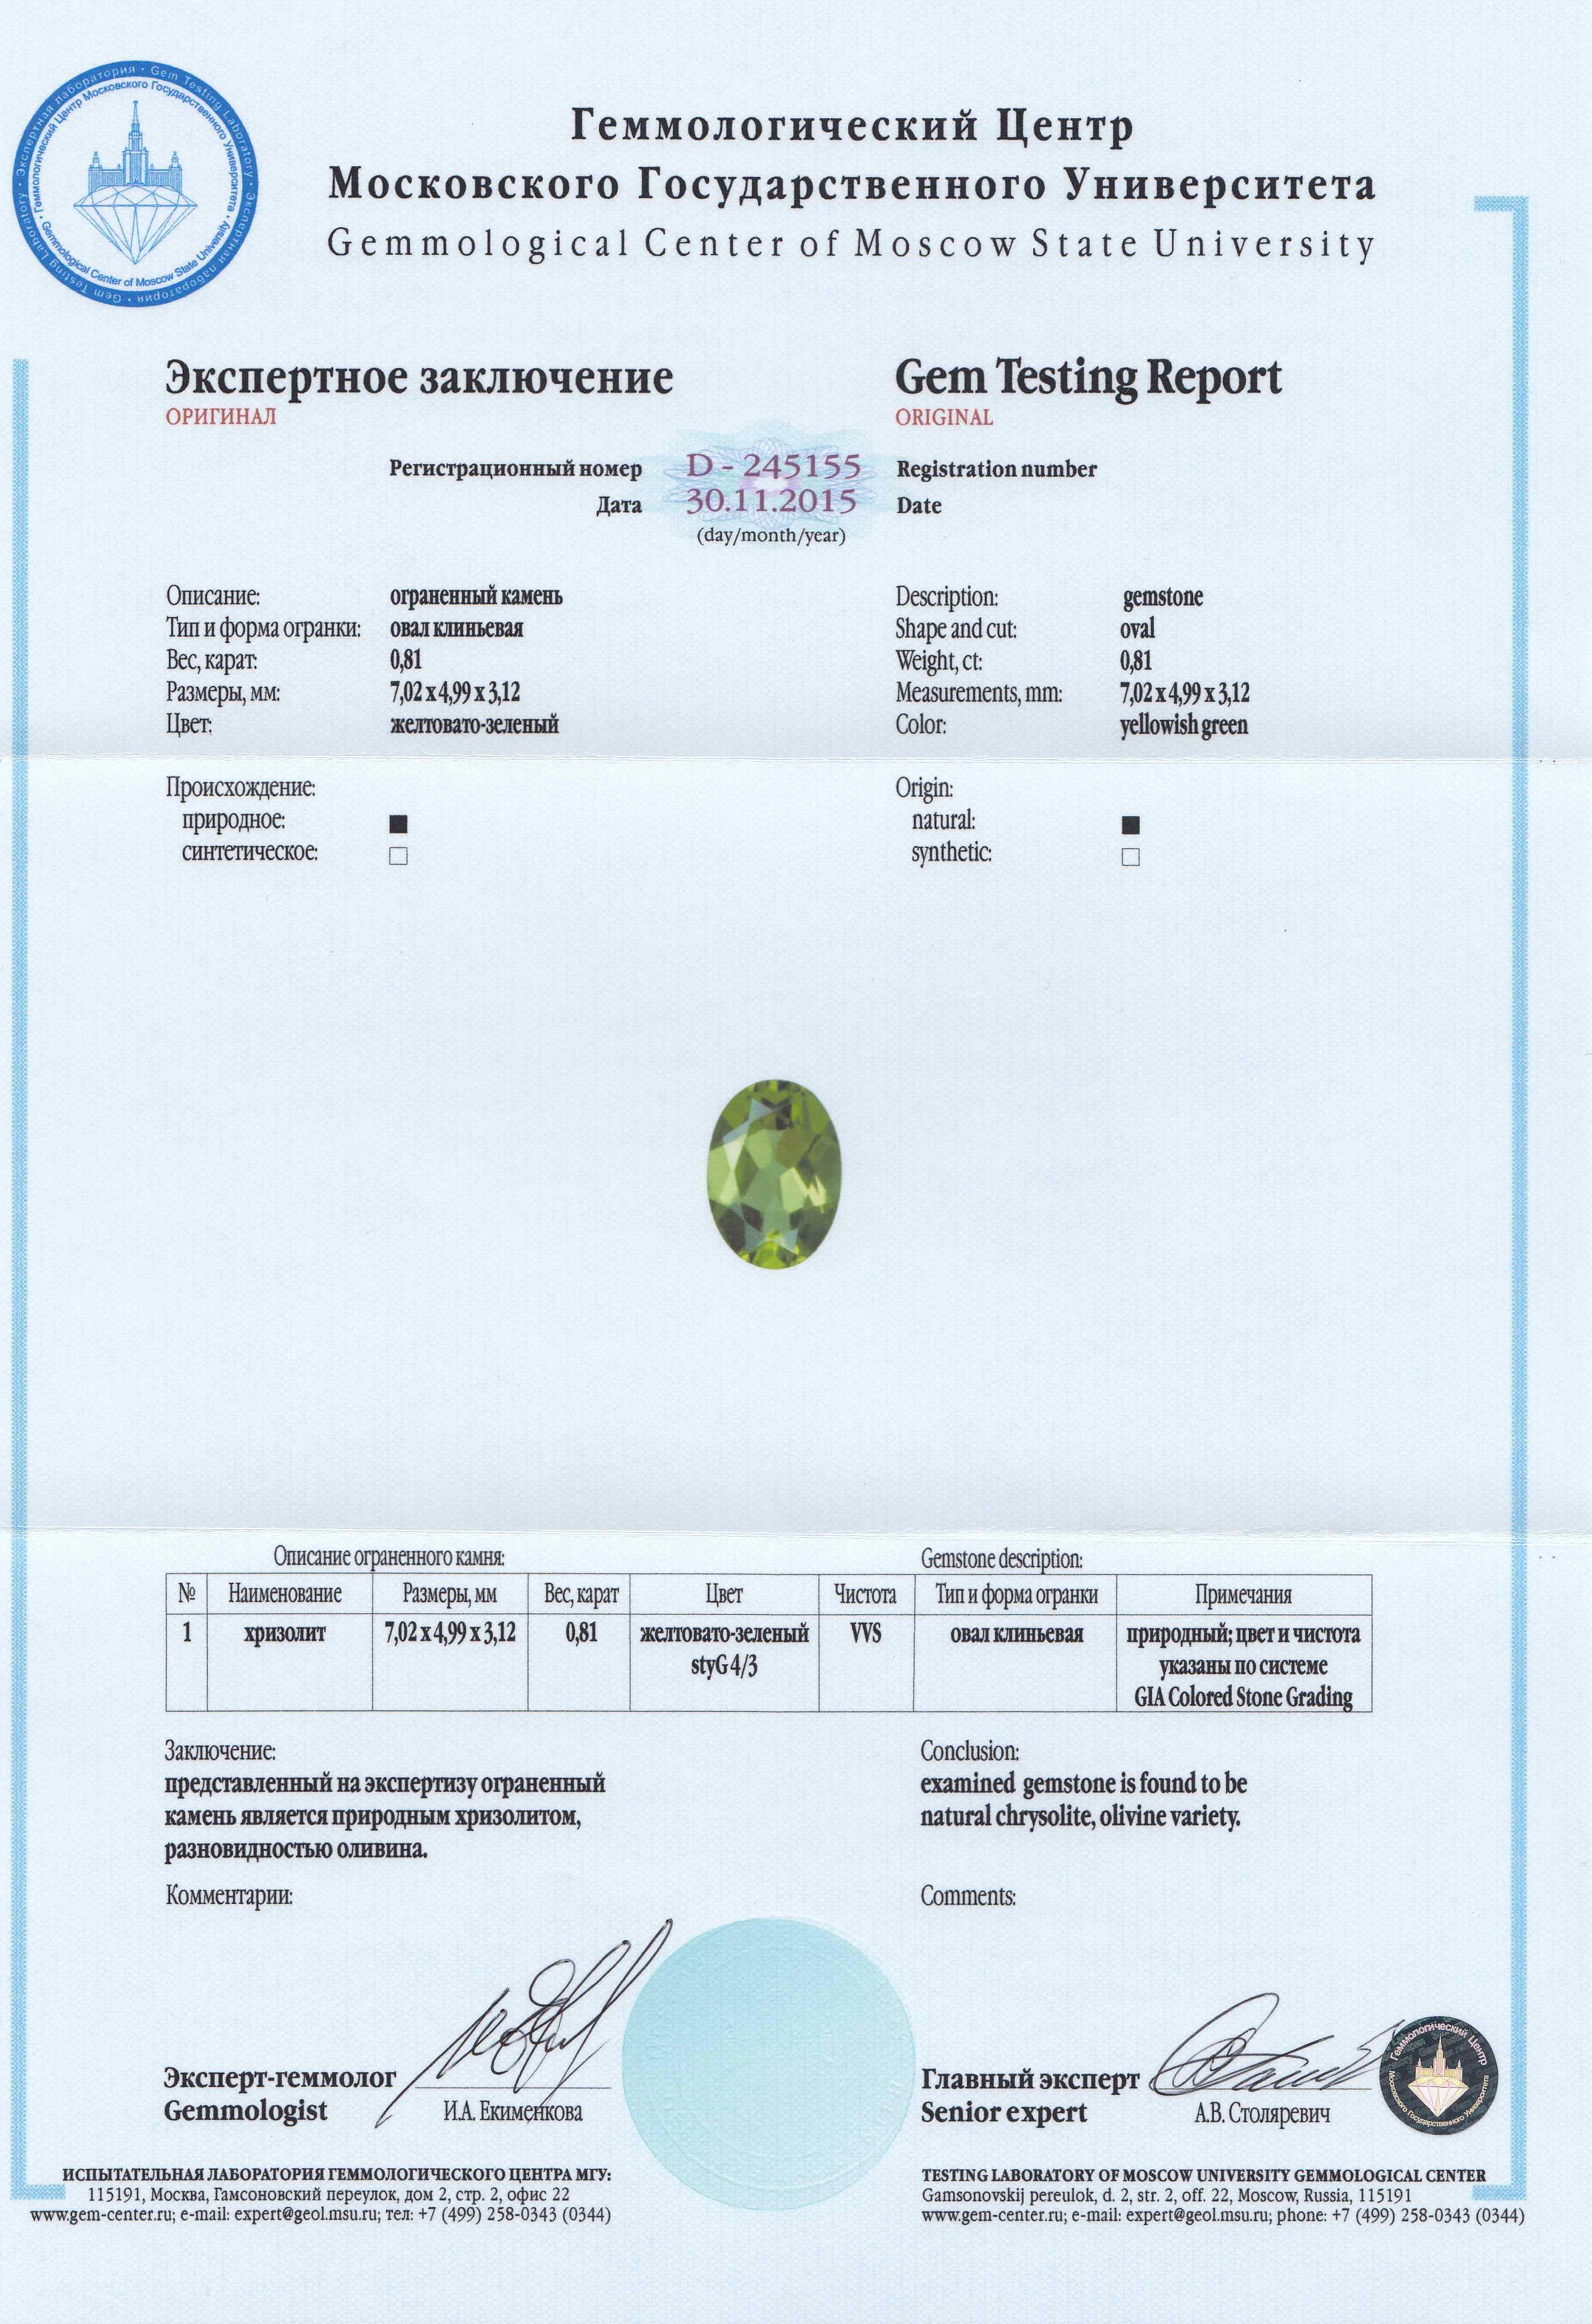 http://mineralmarket.ru/img/certificate/134.jpg